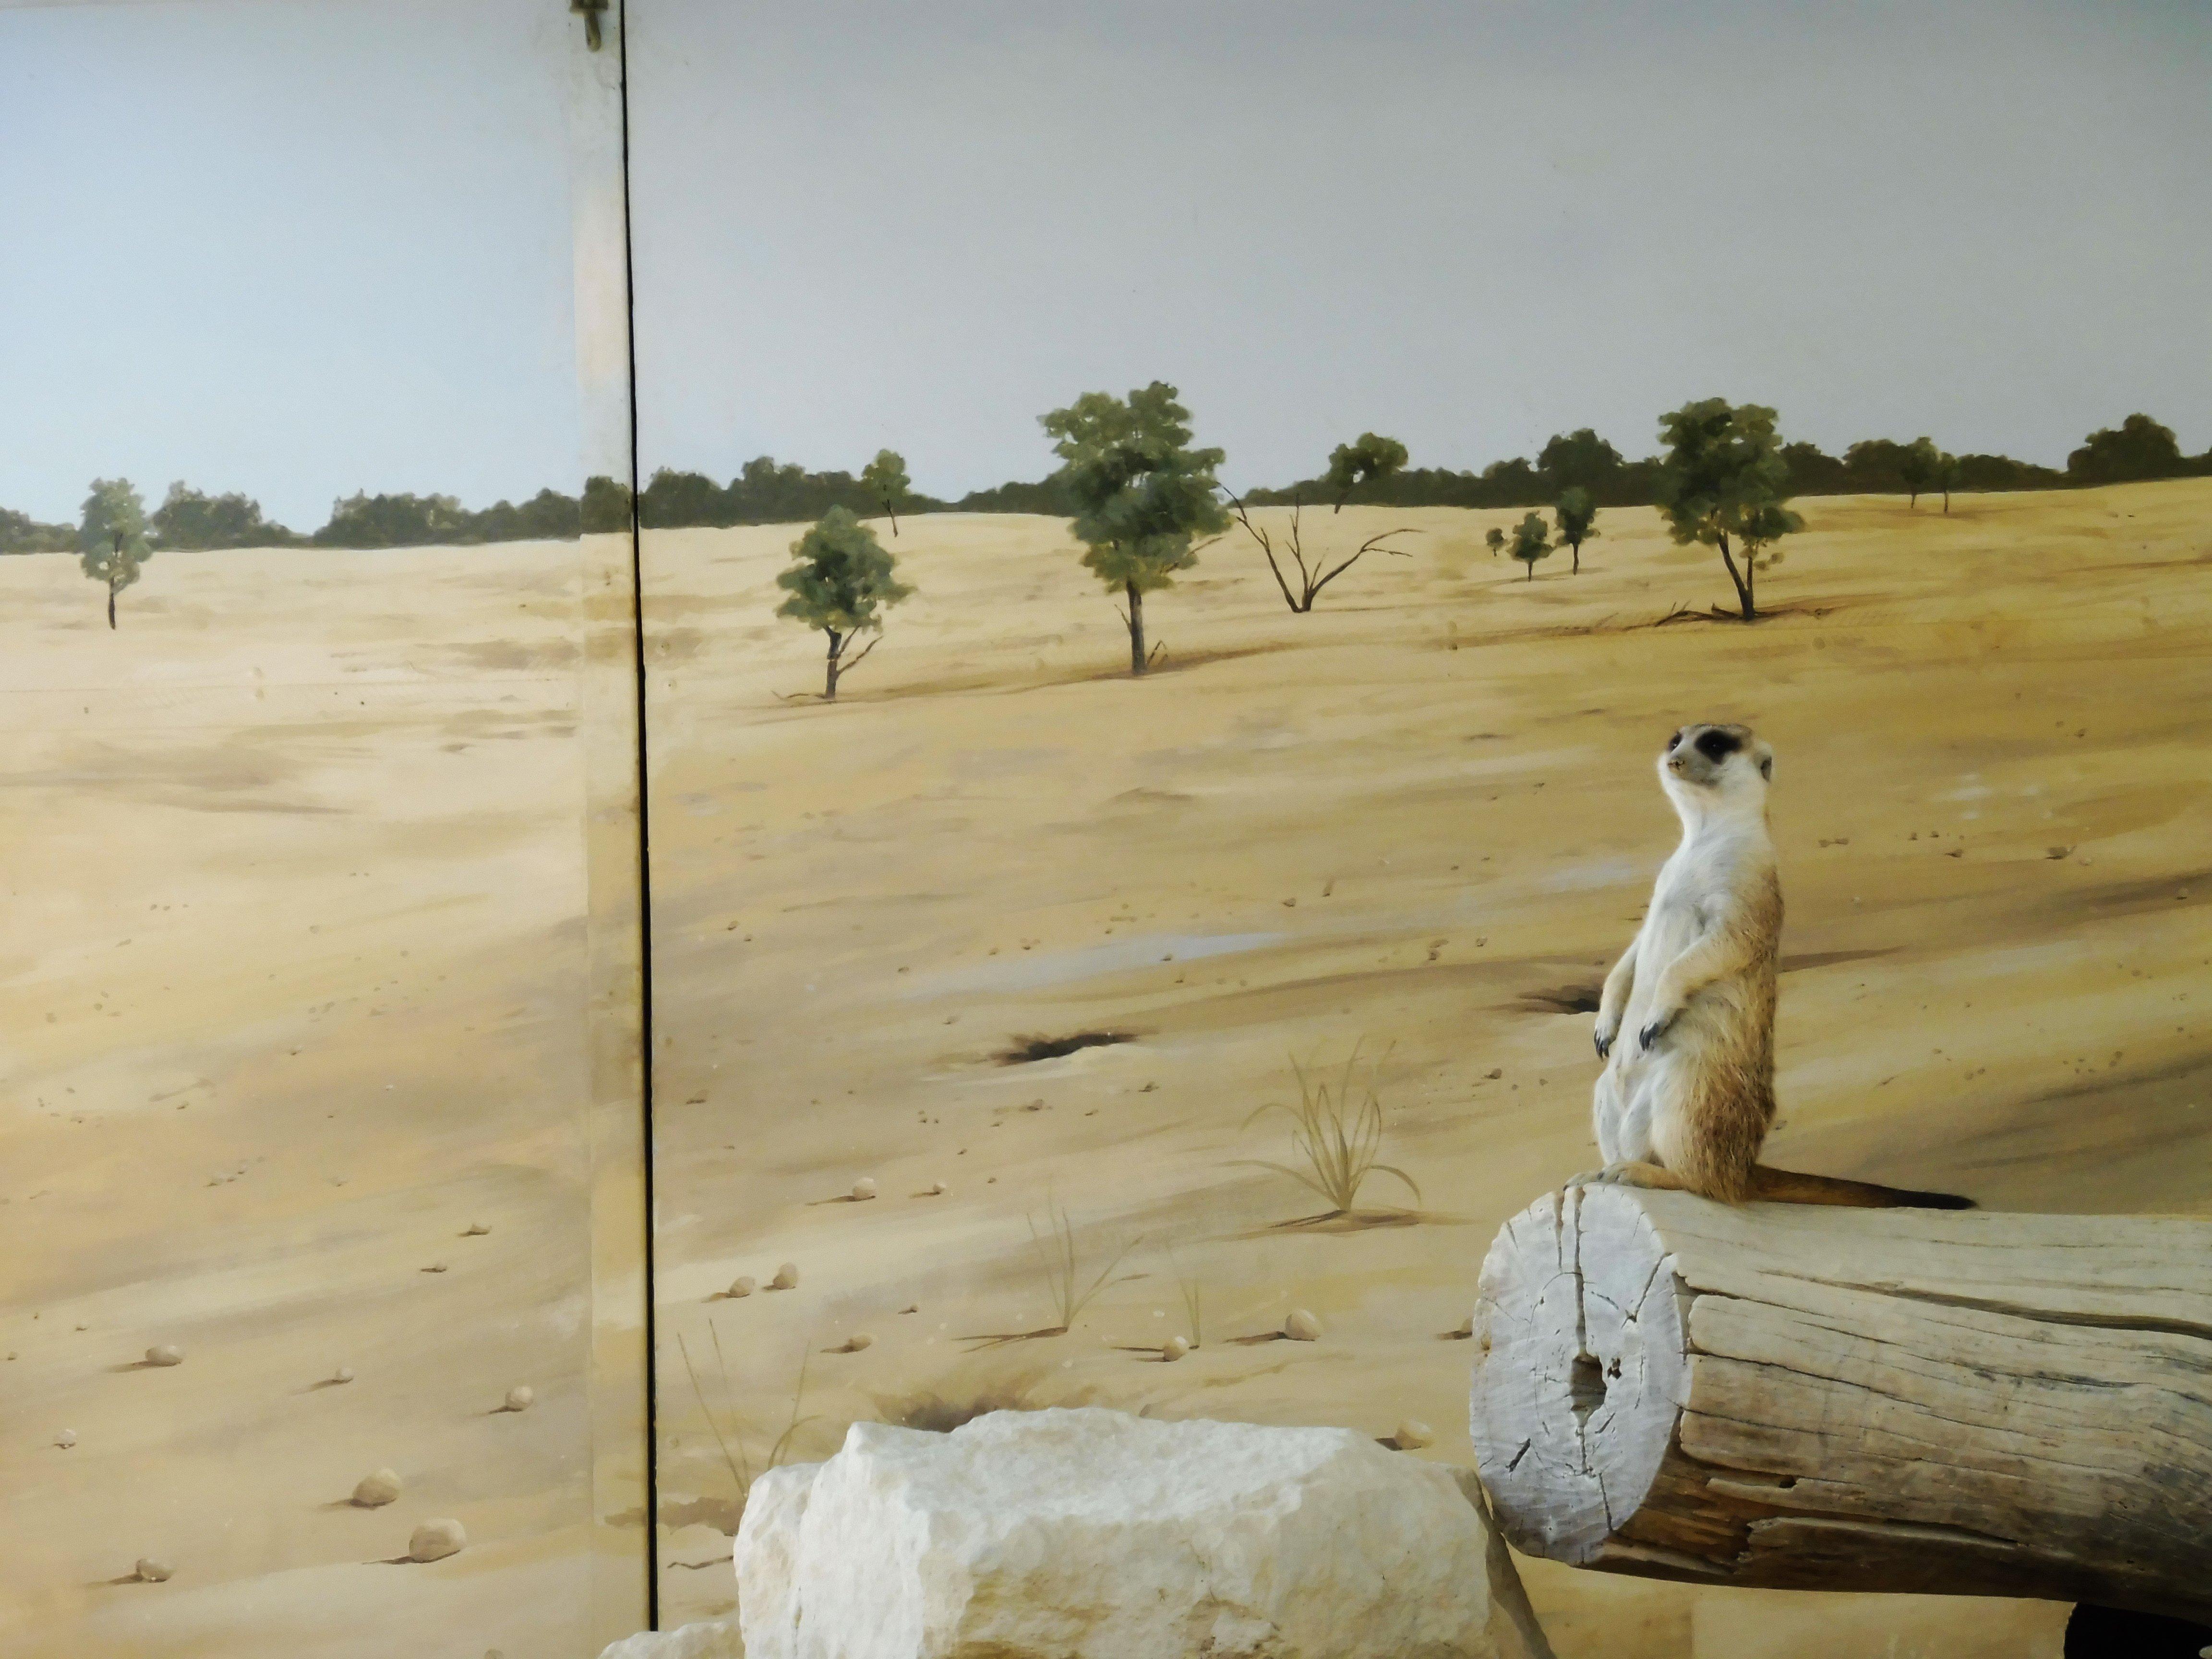 WARNING! More meerkat pictures ahead!